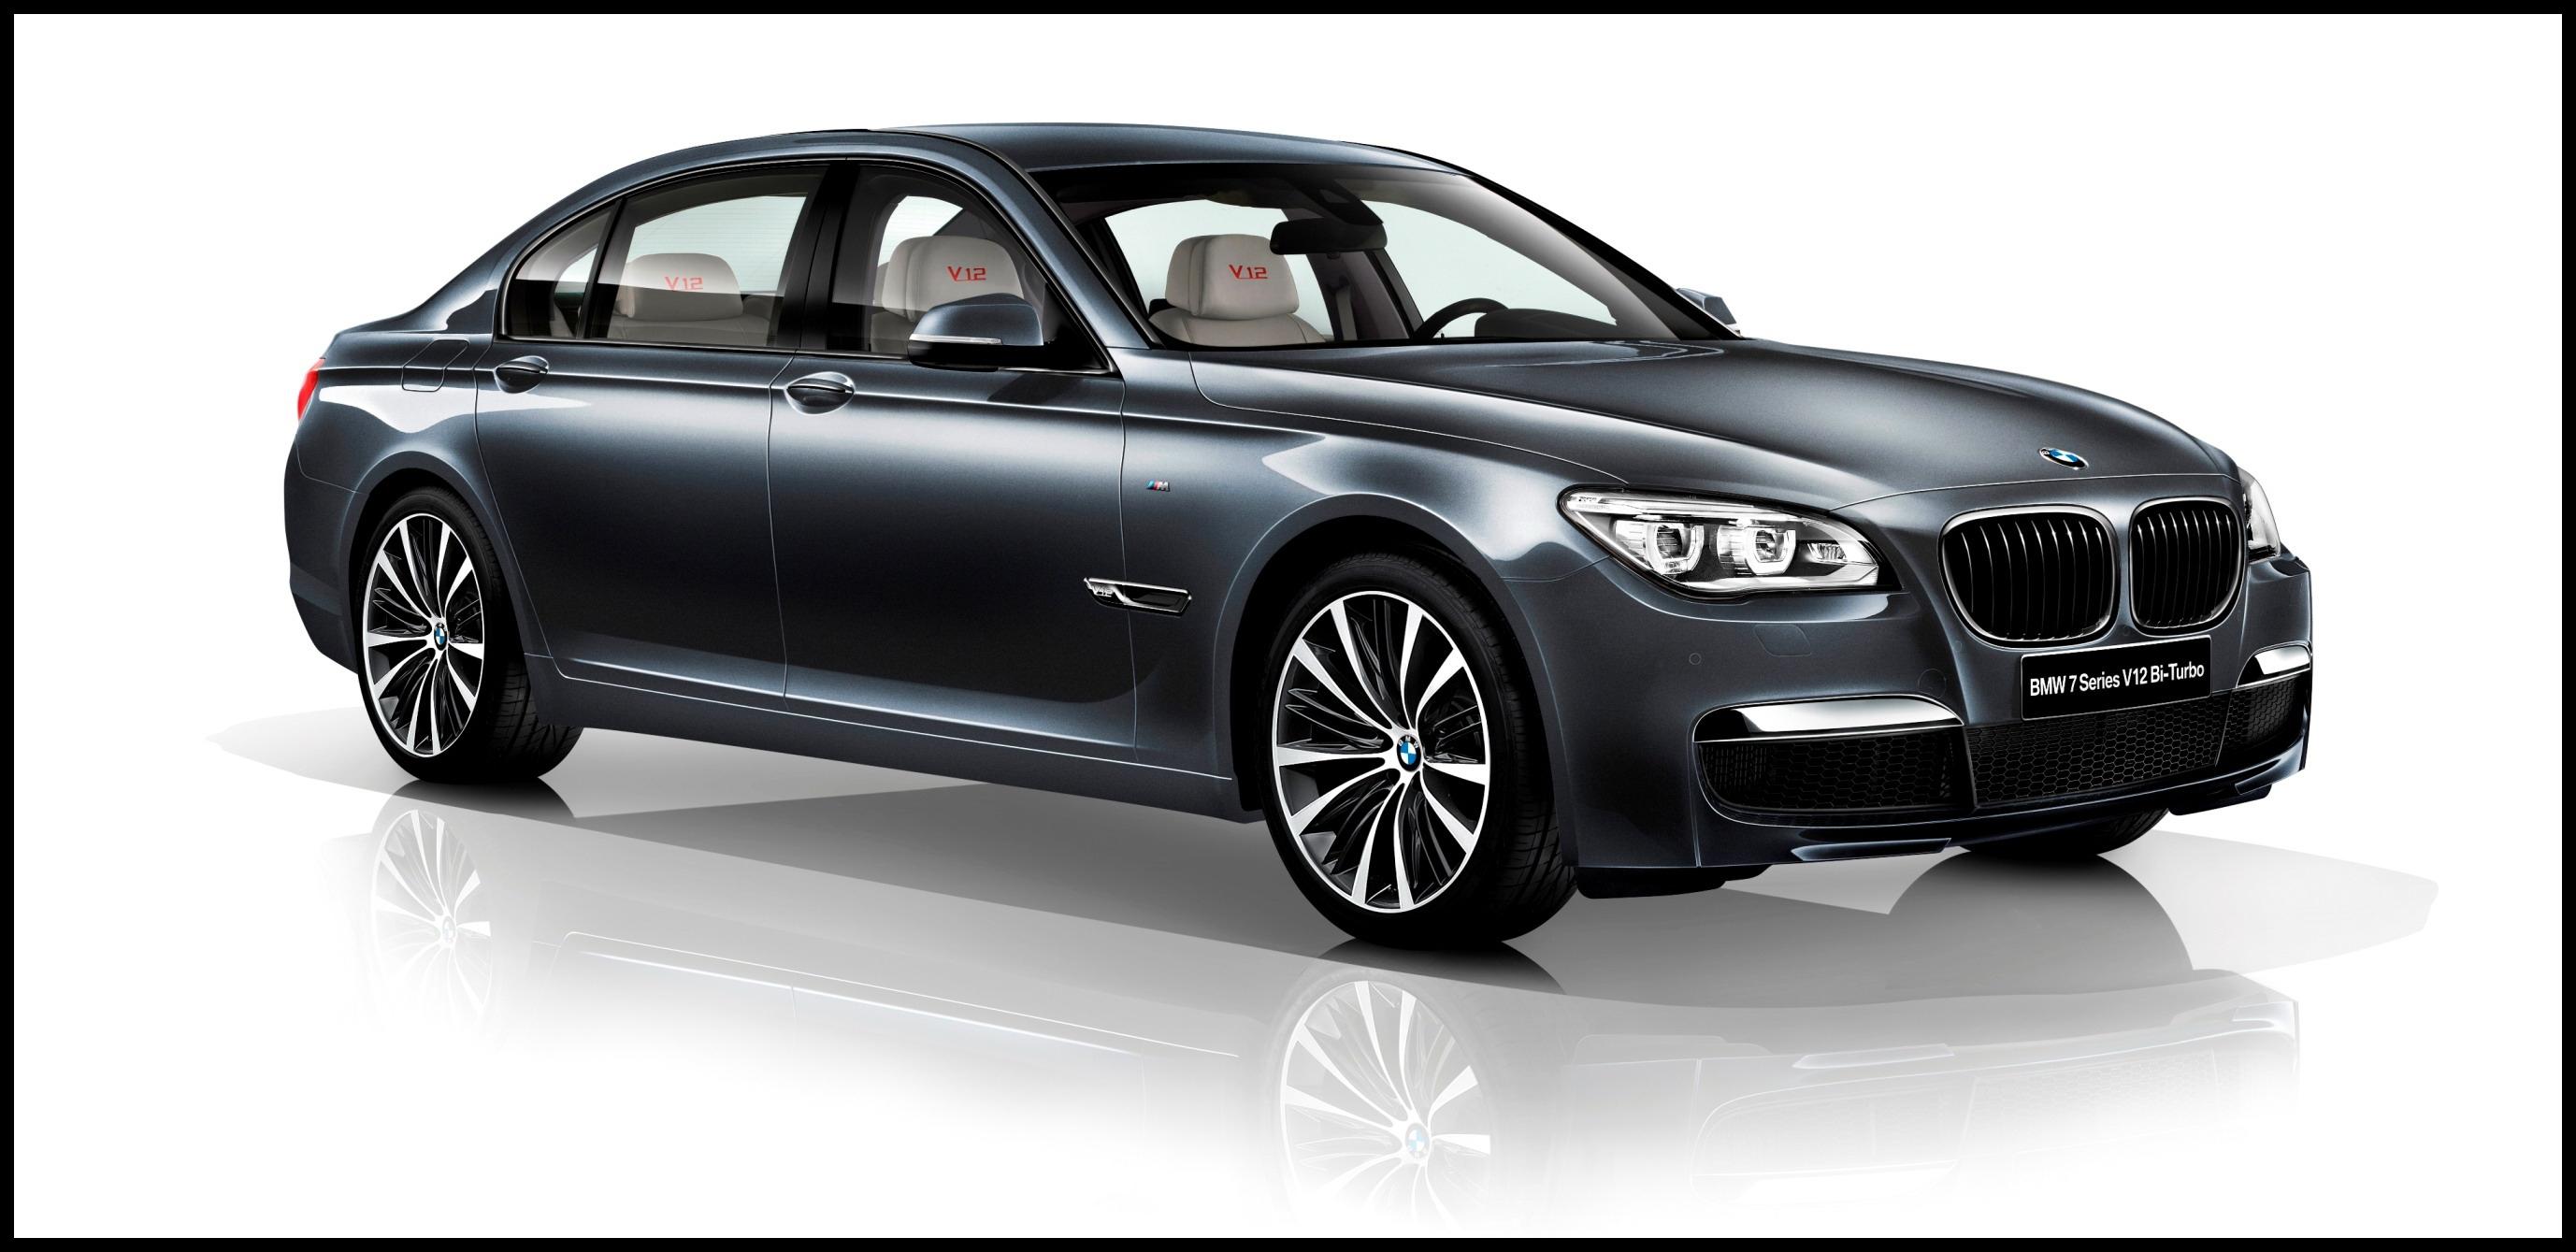 2013 BMW 7 Series V12 Bi Turbo Special Edition